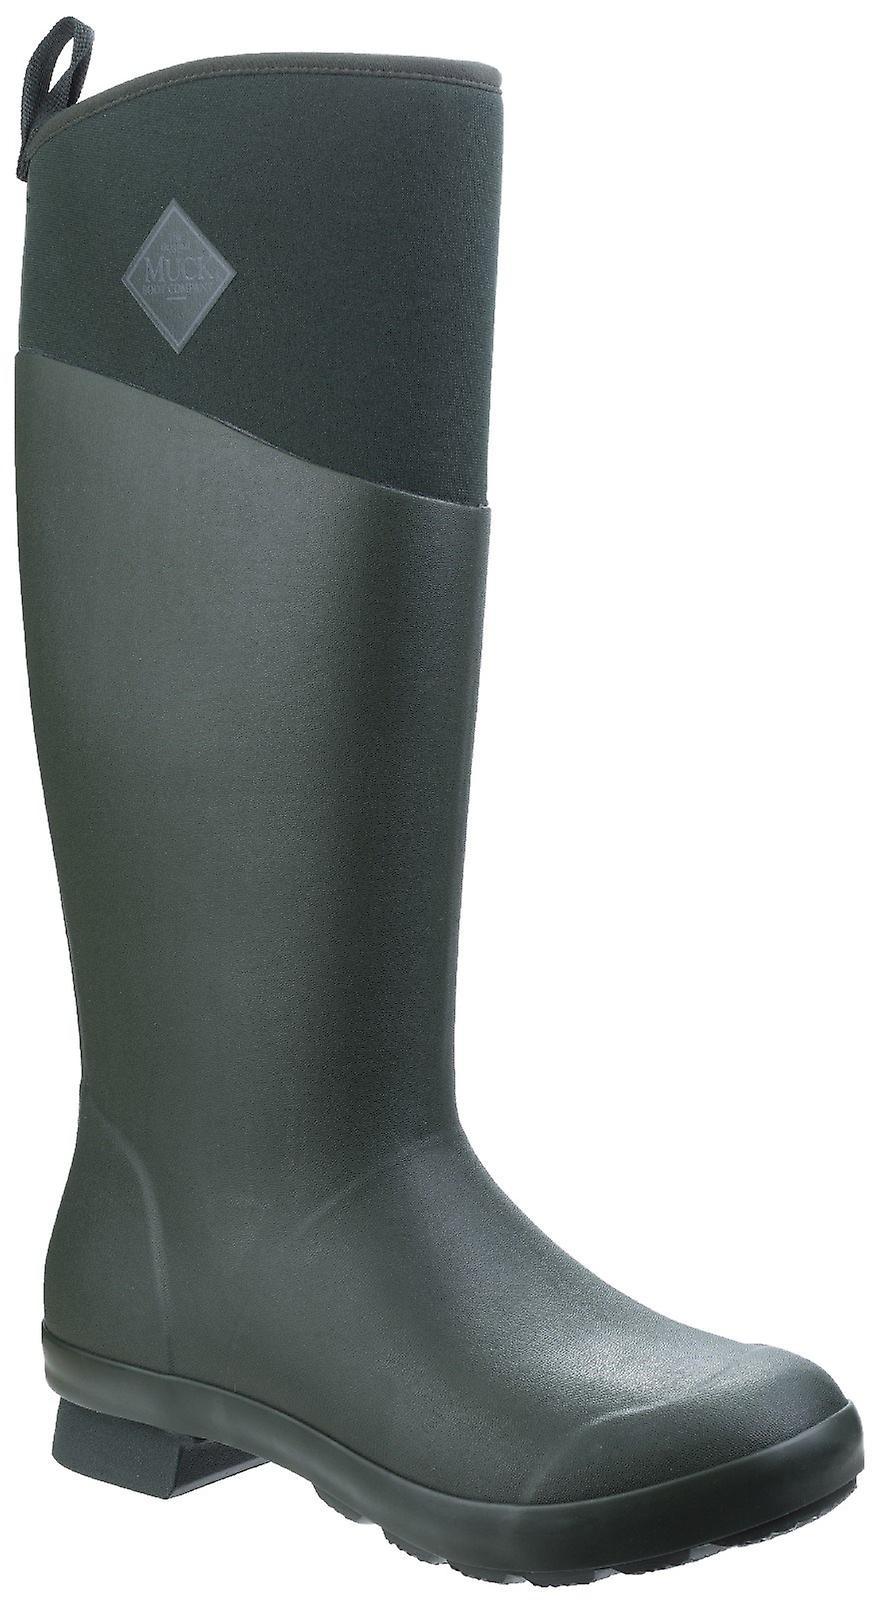 Muck Boots Tremont Wellington Tall Waterproof Women/'s Wellie Boot